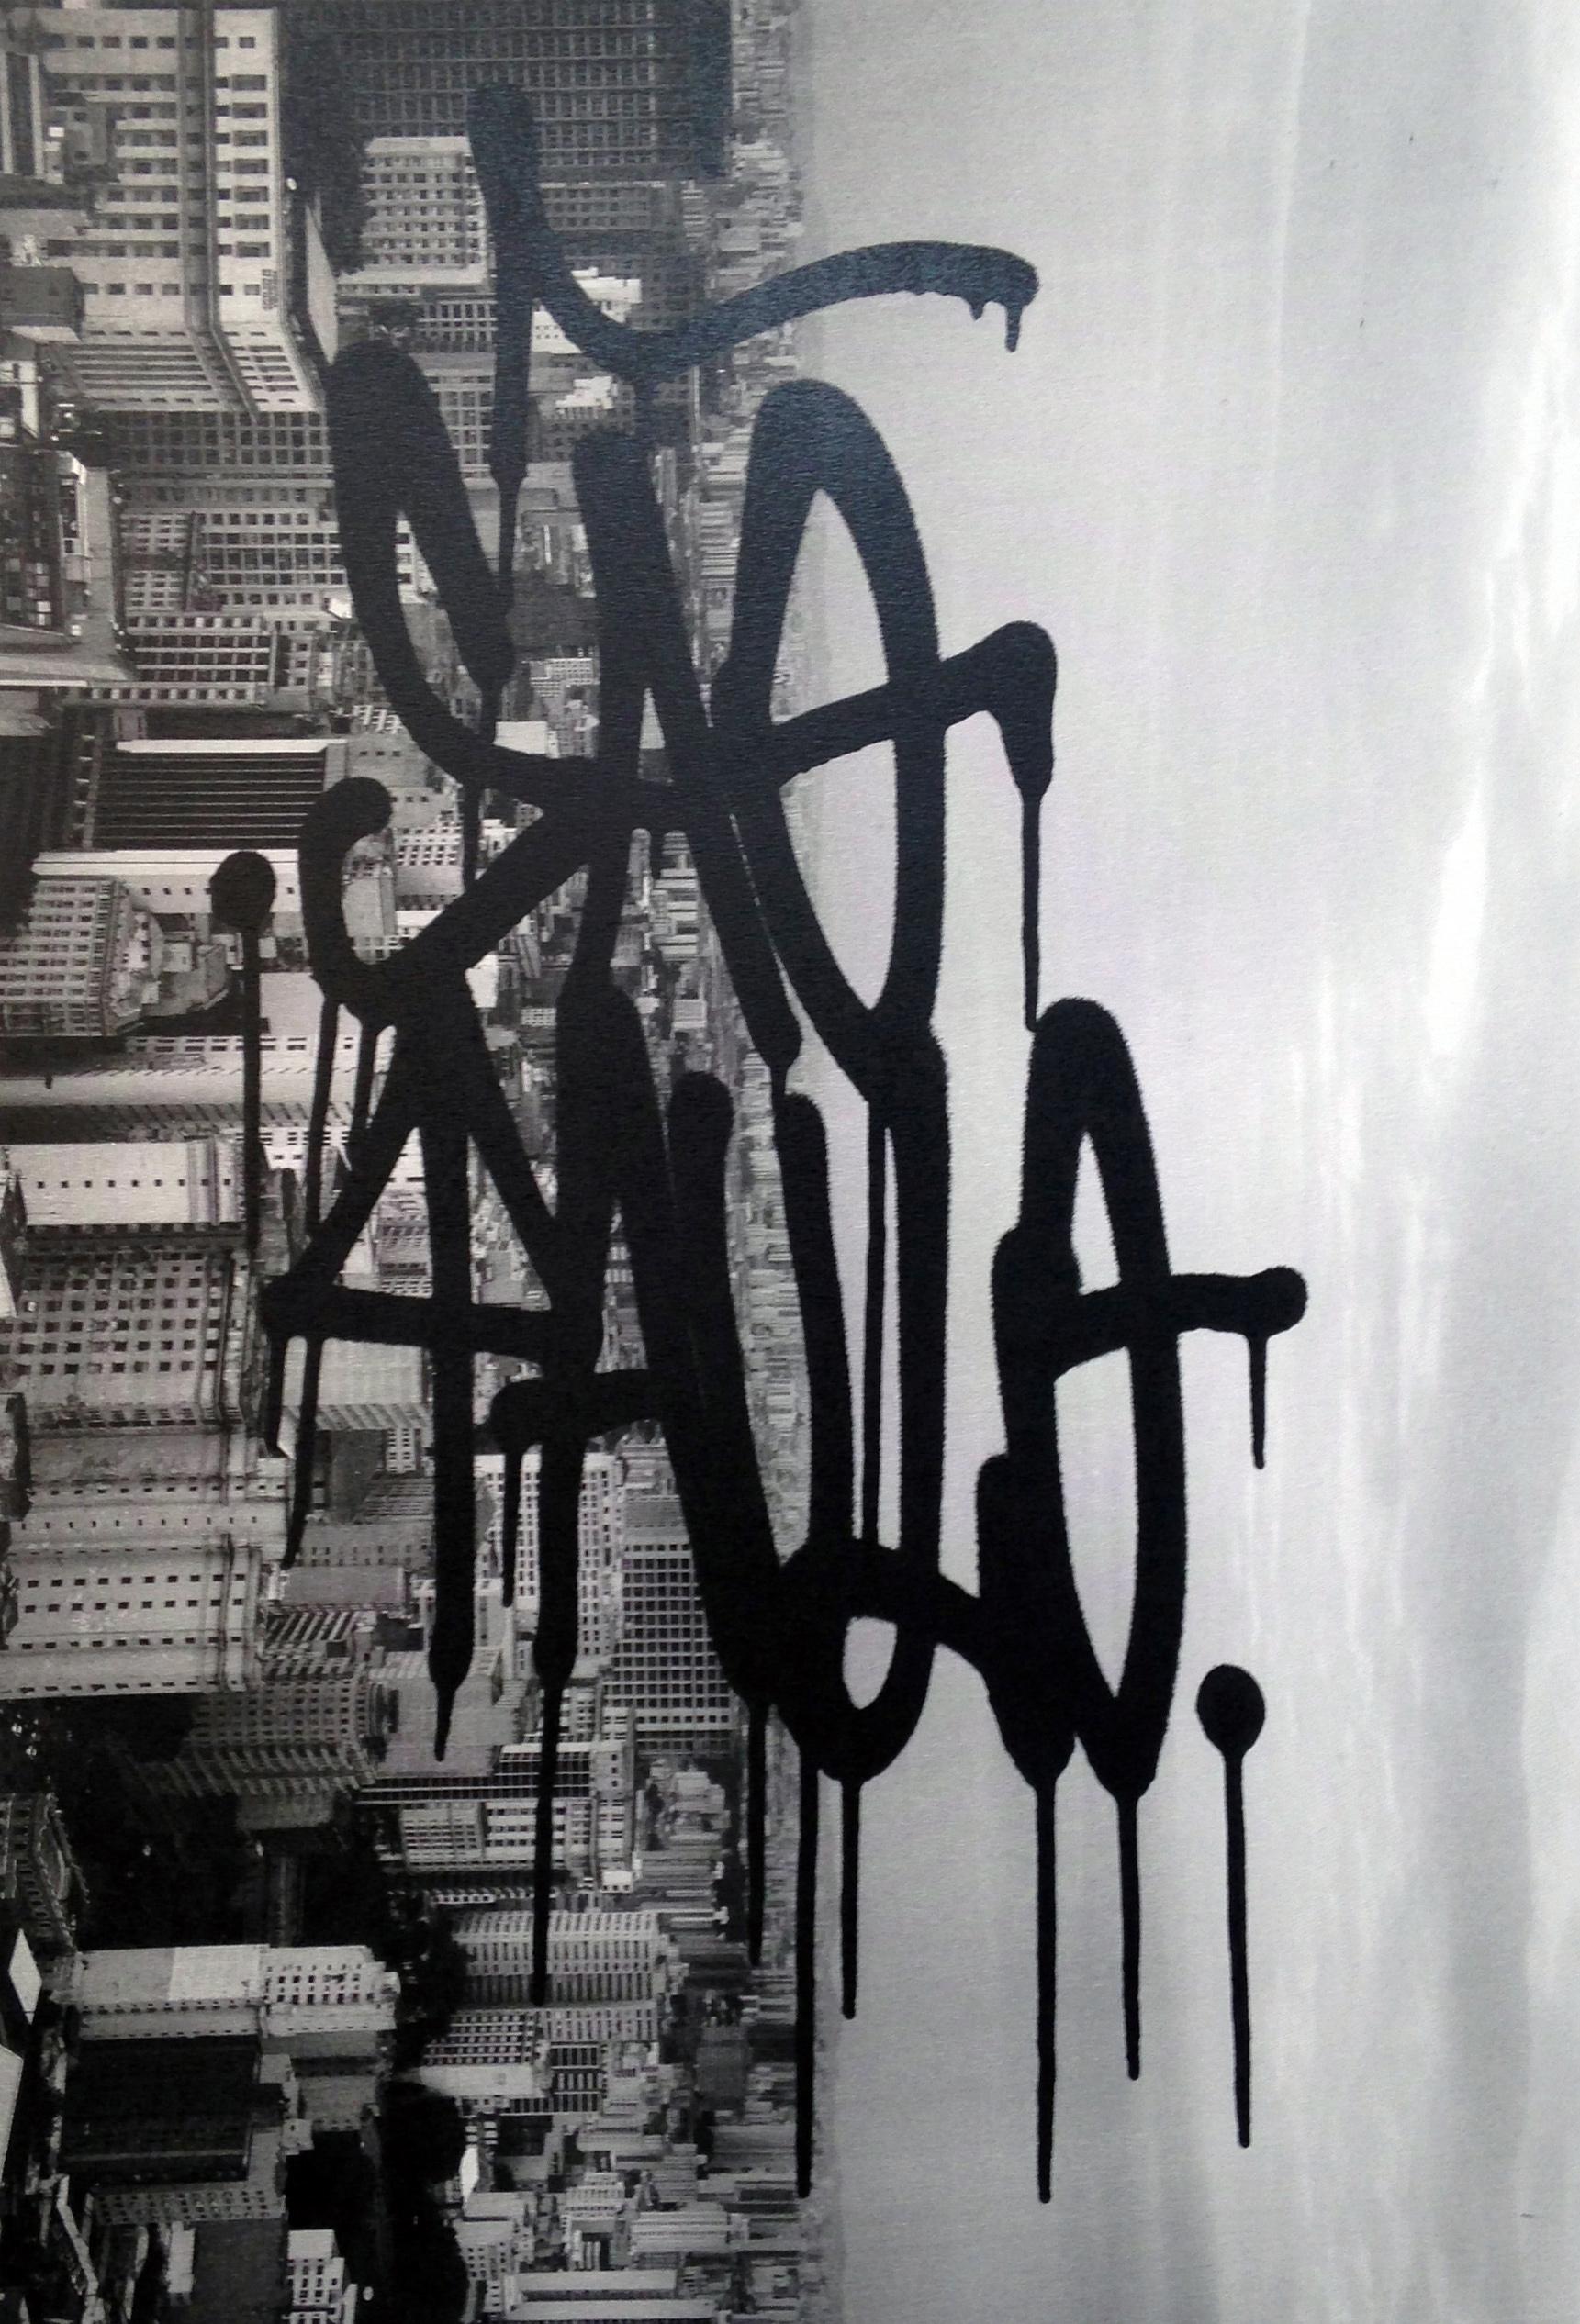 print-Sao-paulo--copy